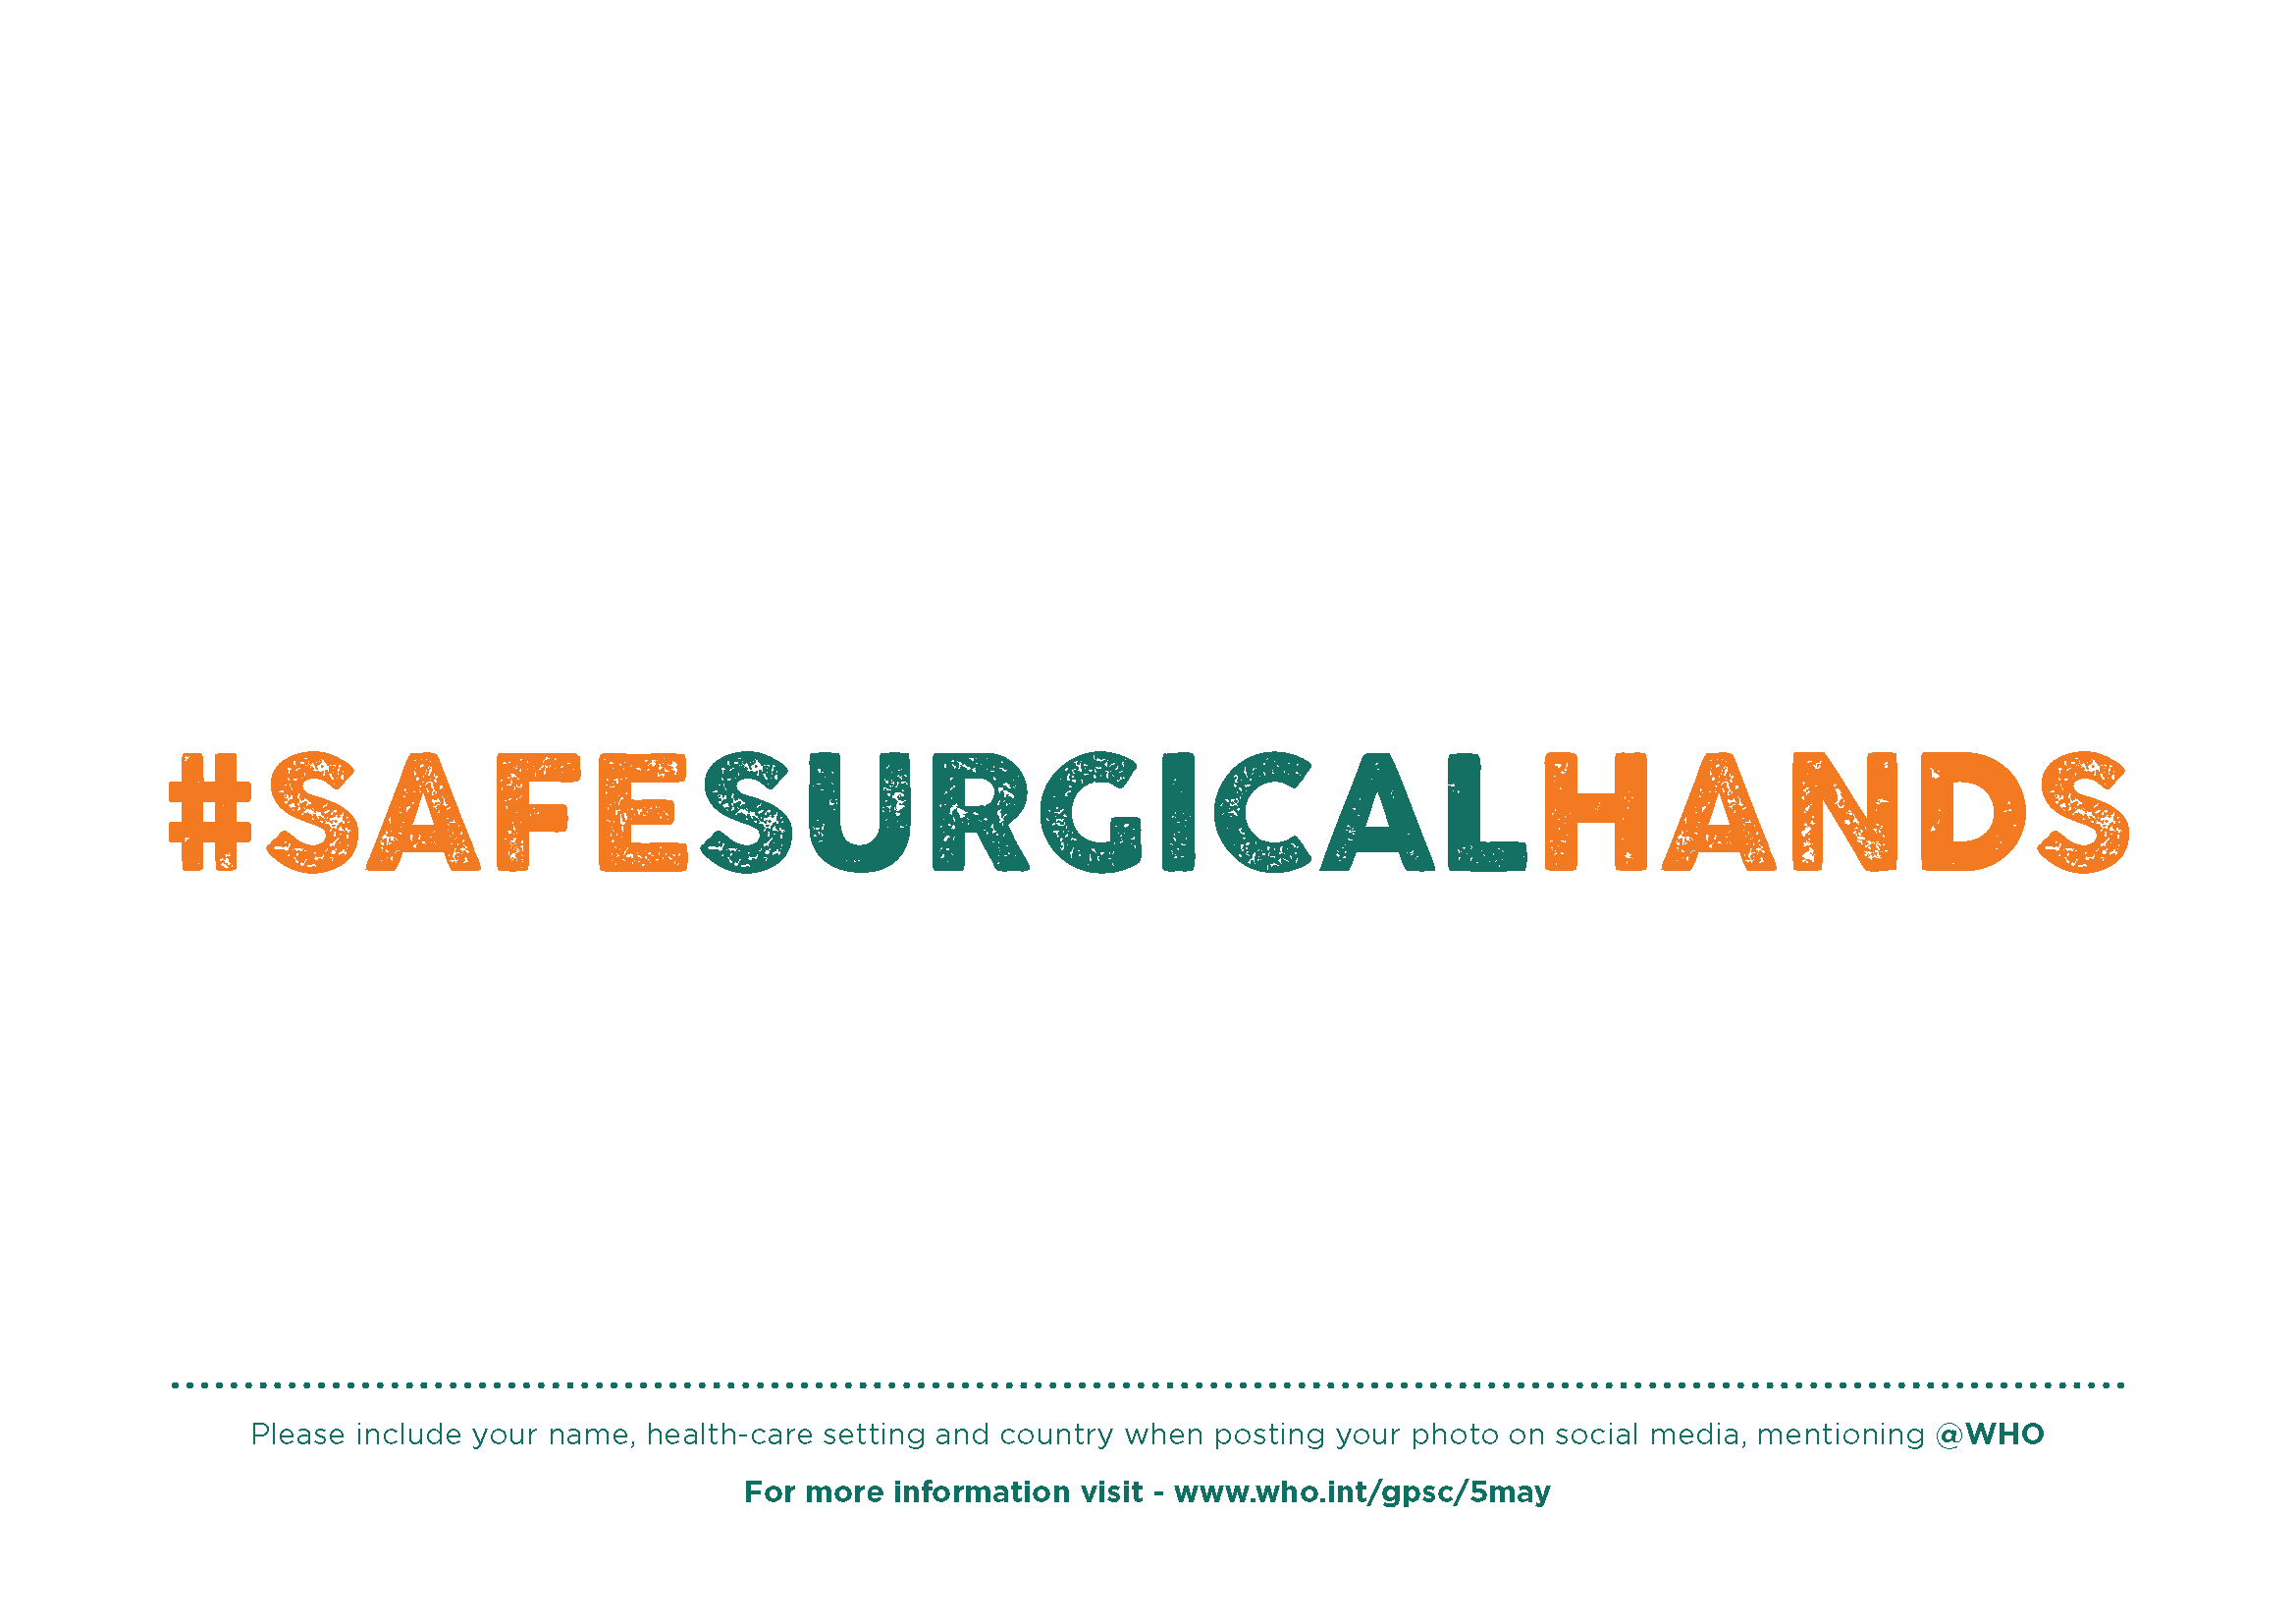 SALVE VIDAS, límpiese las manos #safesurgicalhands